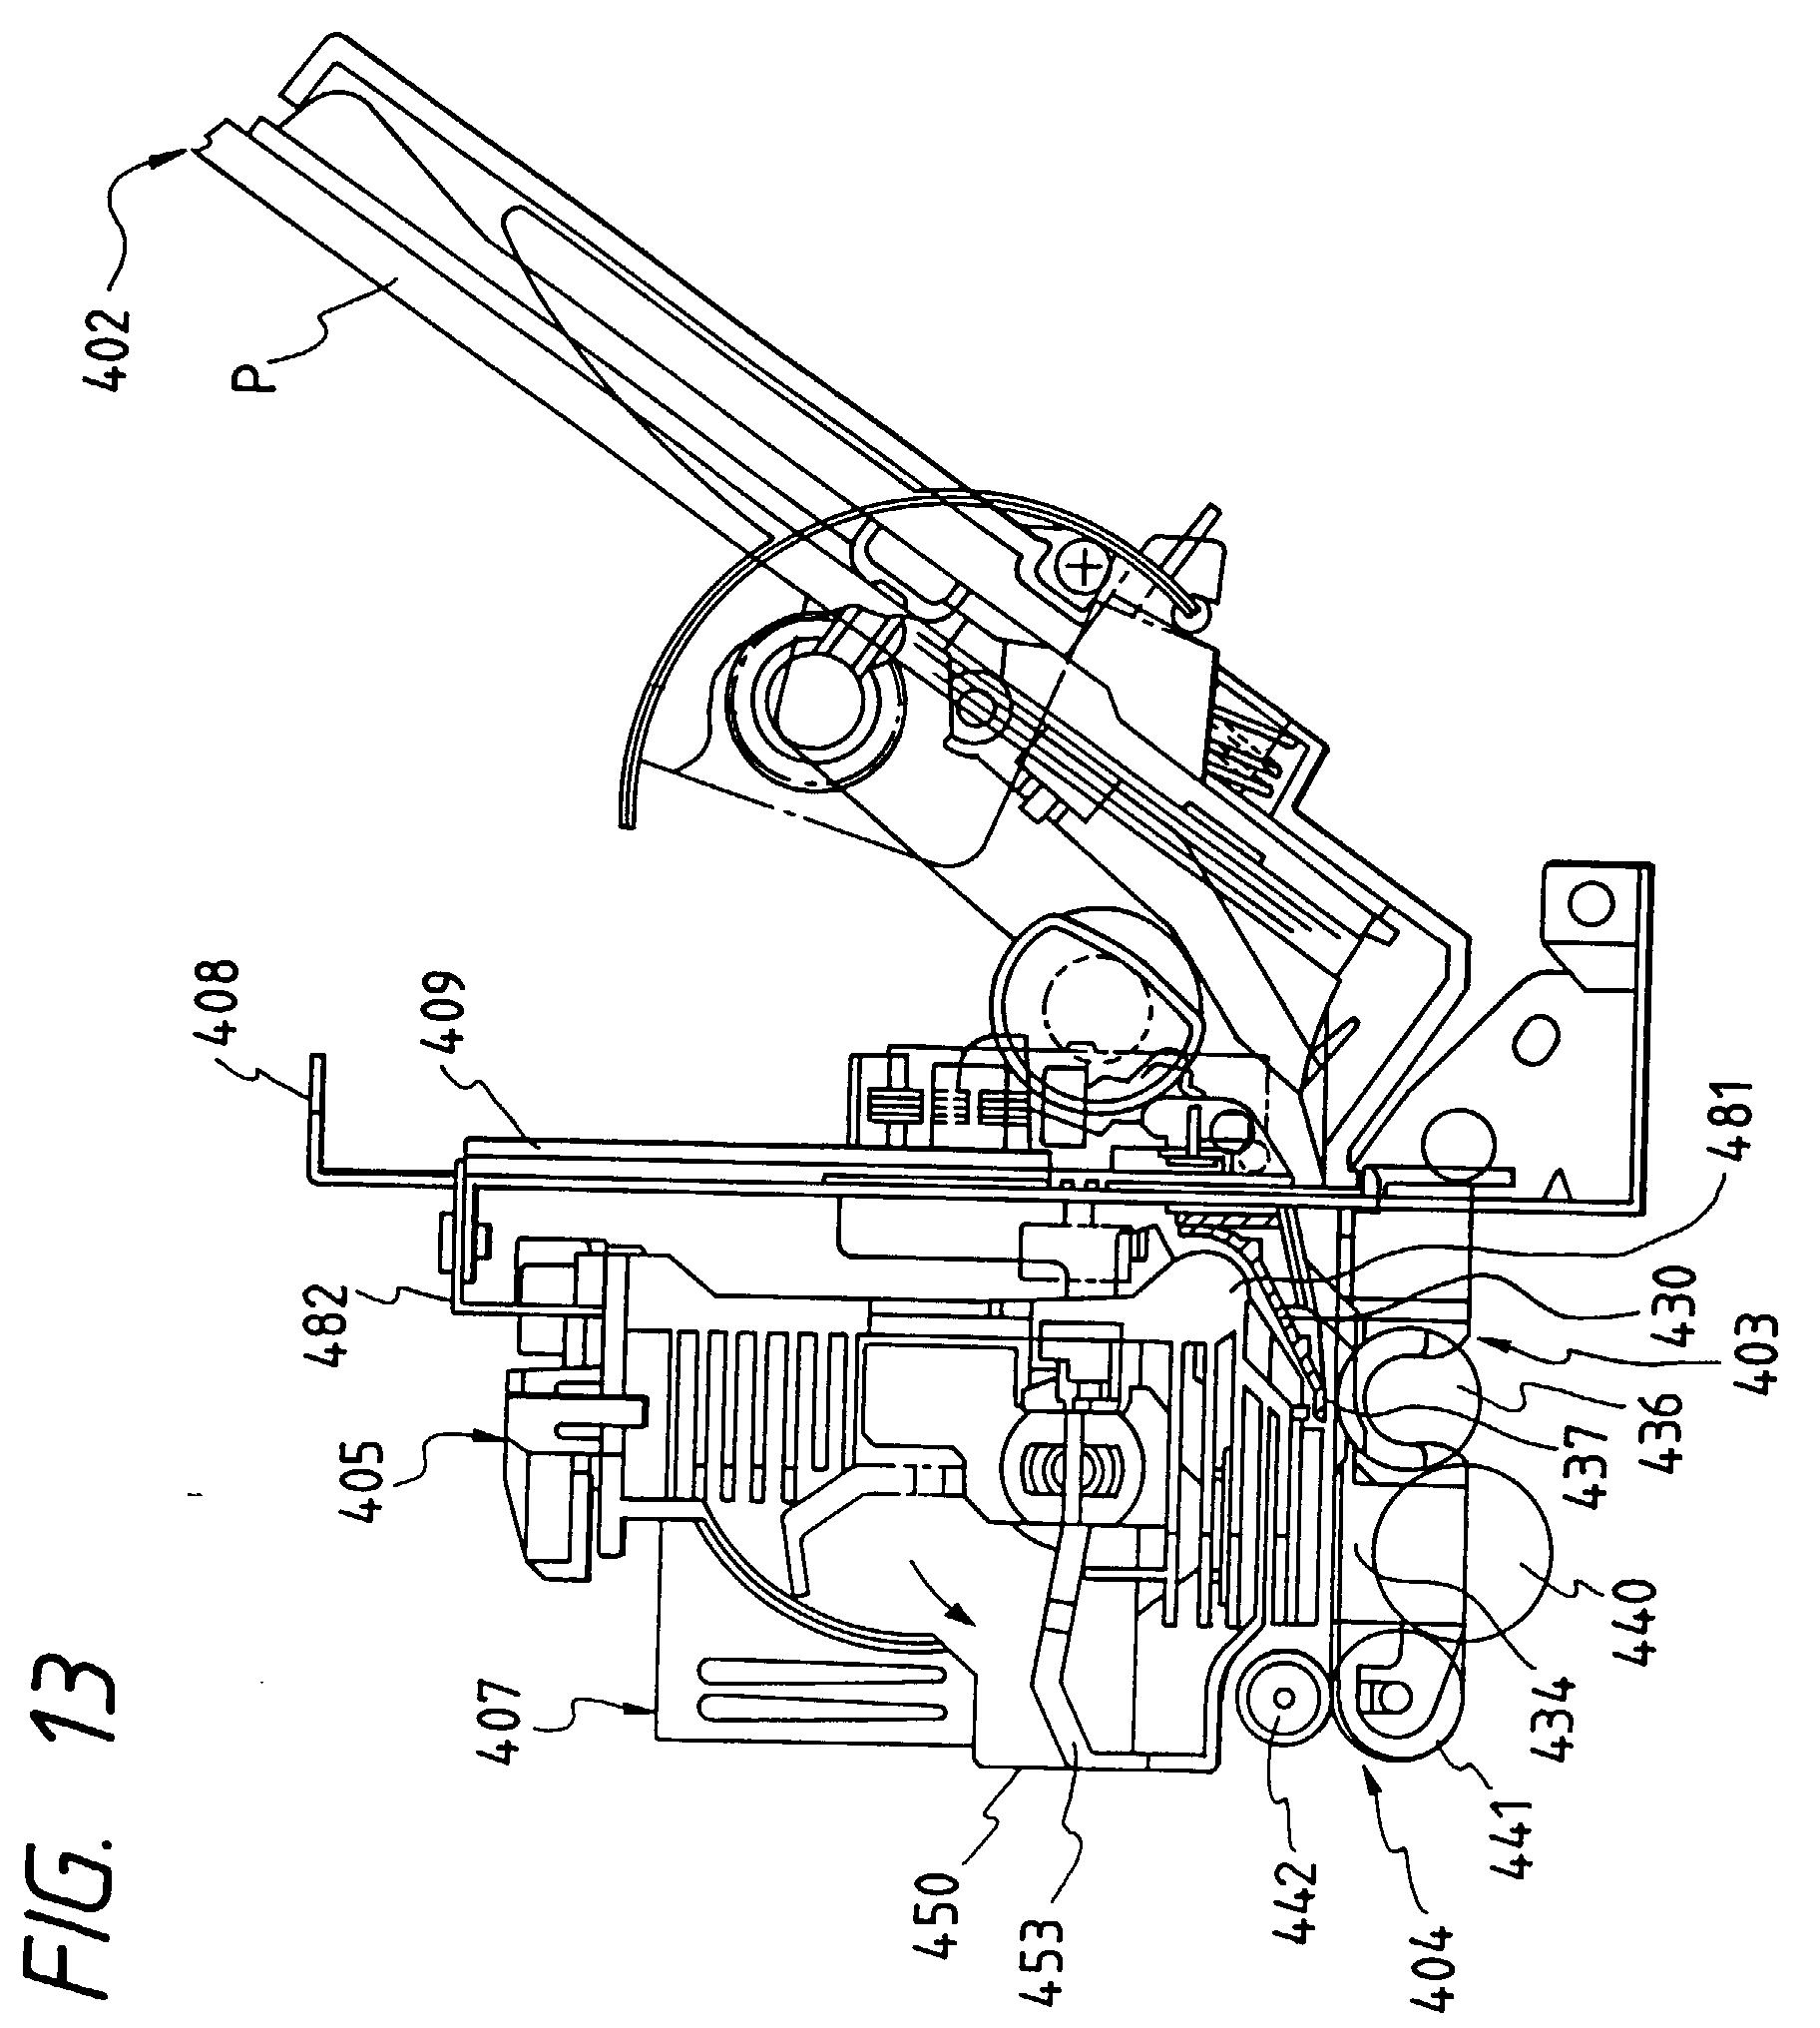 Gm Lt5 Engine Diagram Gm Get Free Image About Wiring Diagram